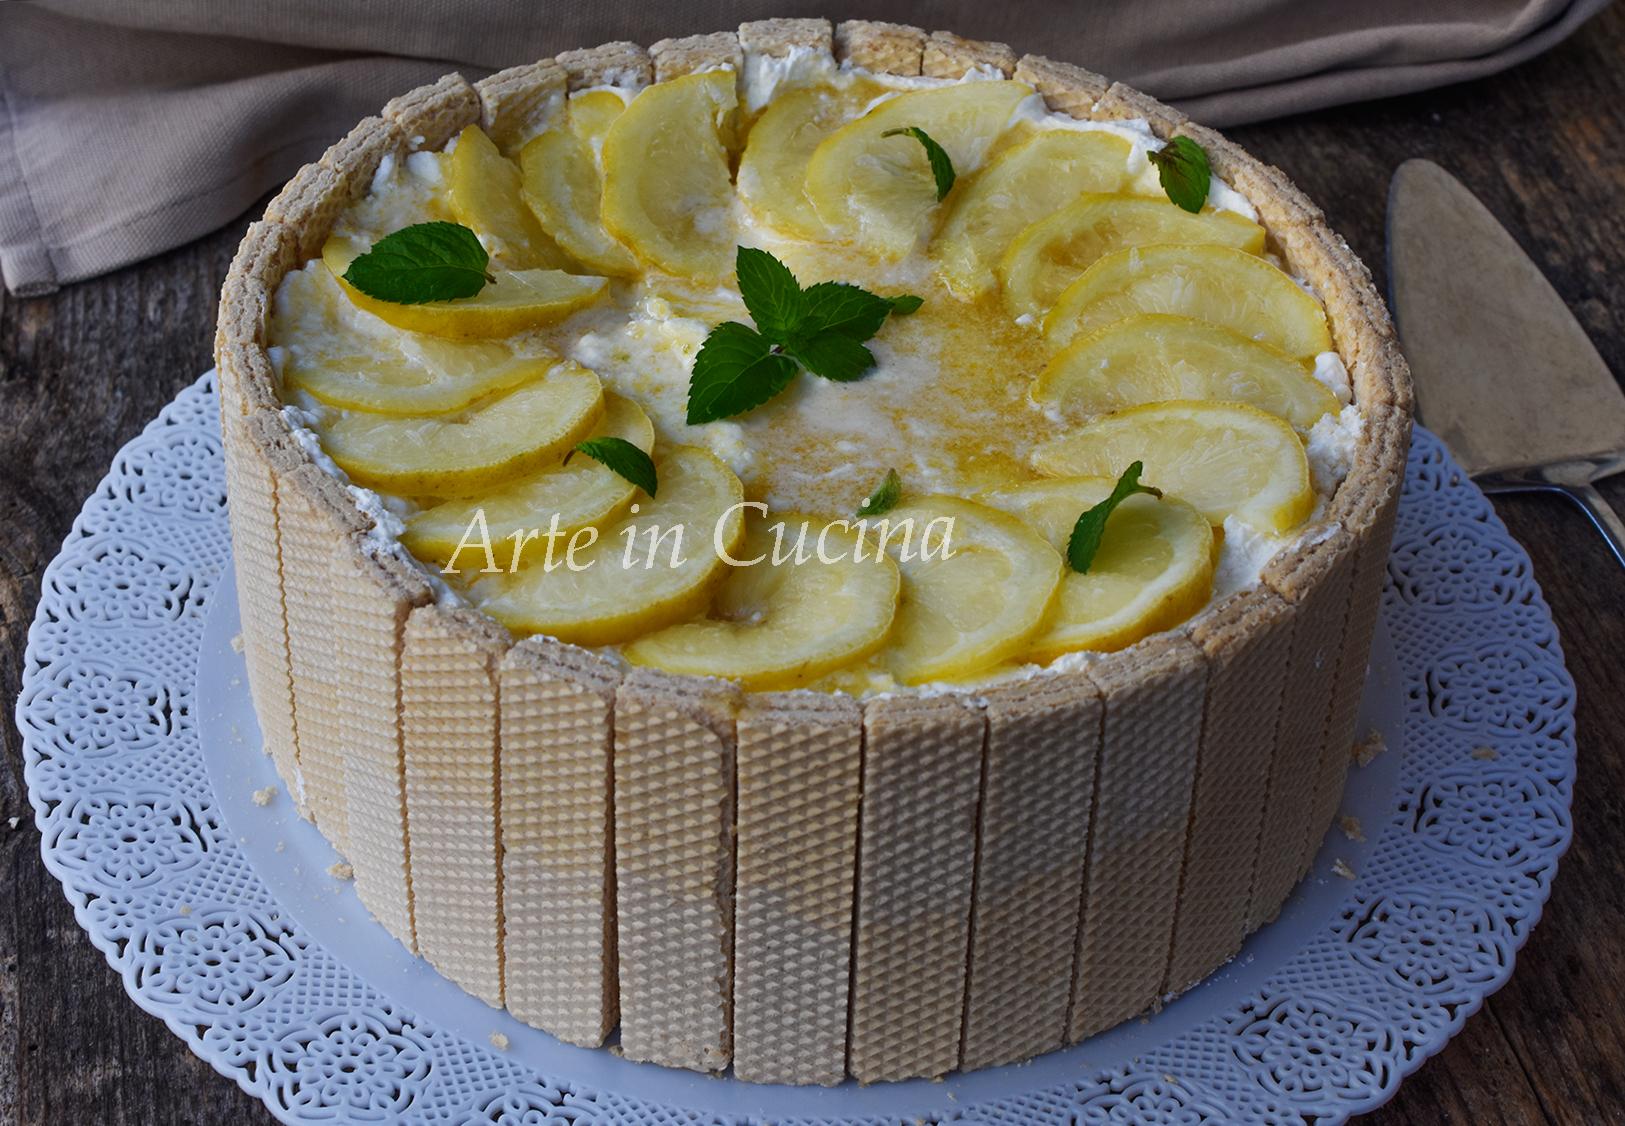 Torta di wafer al limone senza cottura dolce freddo veloce vickyart arte in cucina